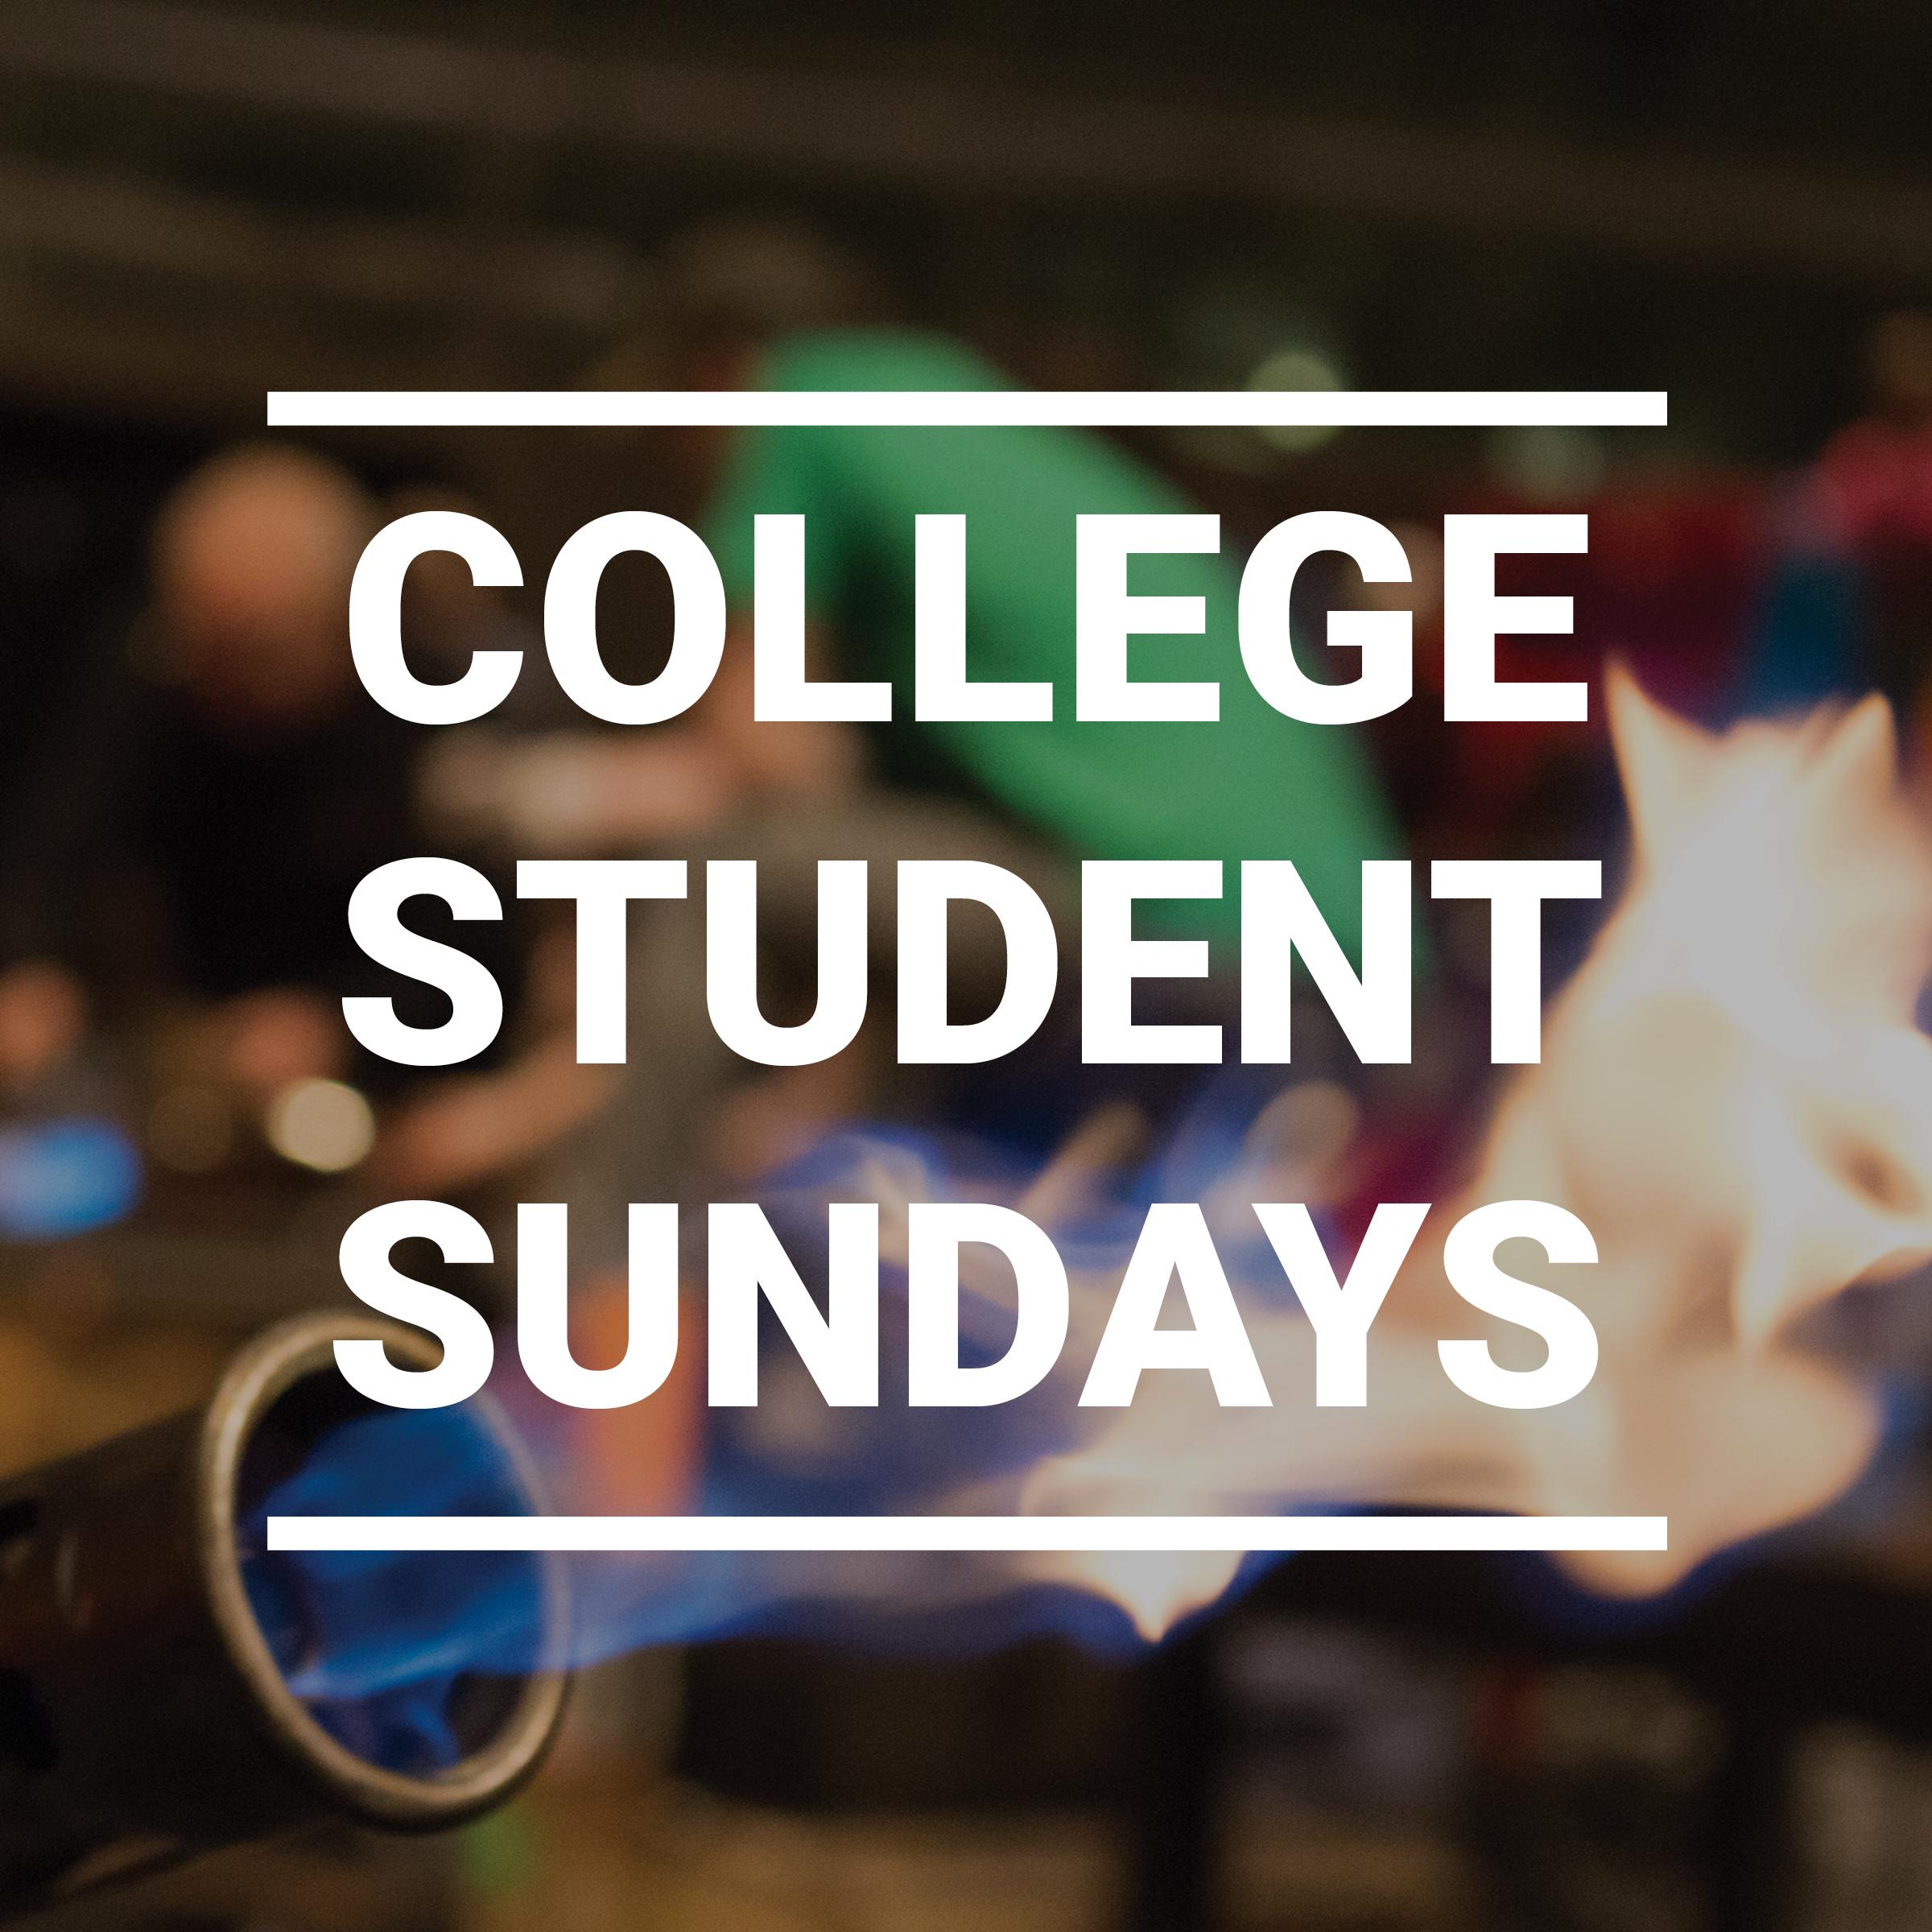 College Student Sunday.jpg